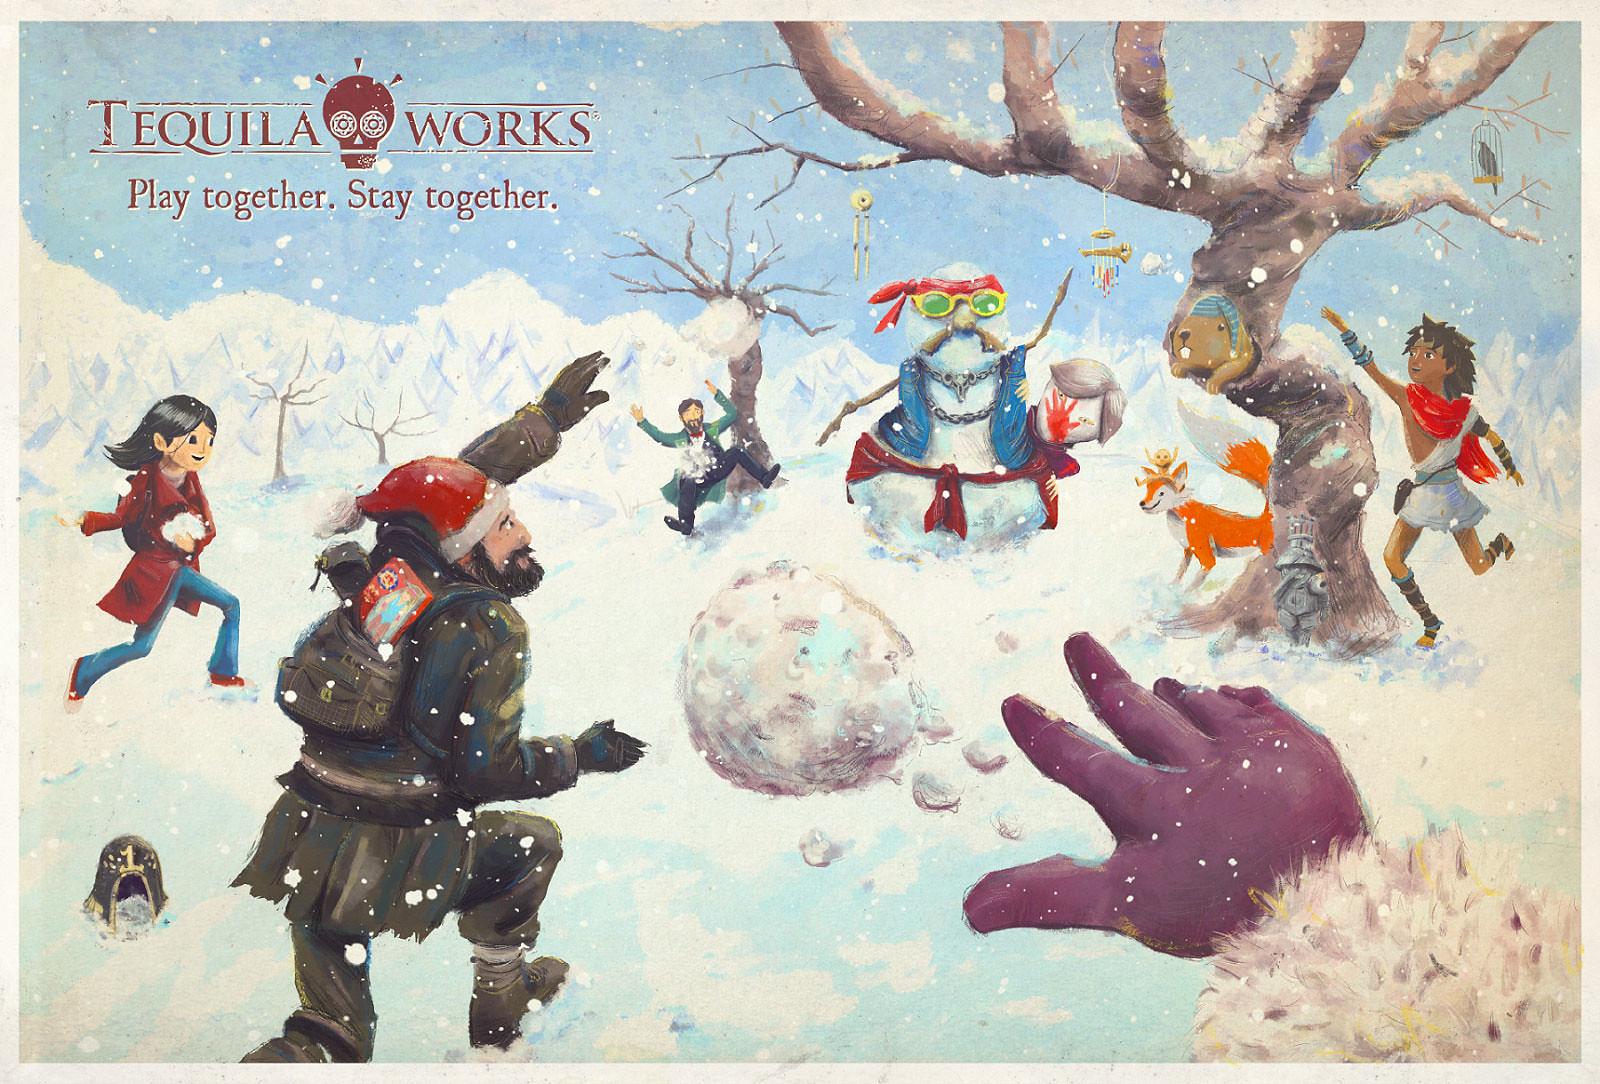 【收图了】PlayStation官博放出大量圣诞贺图